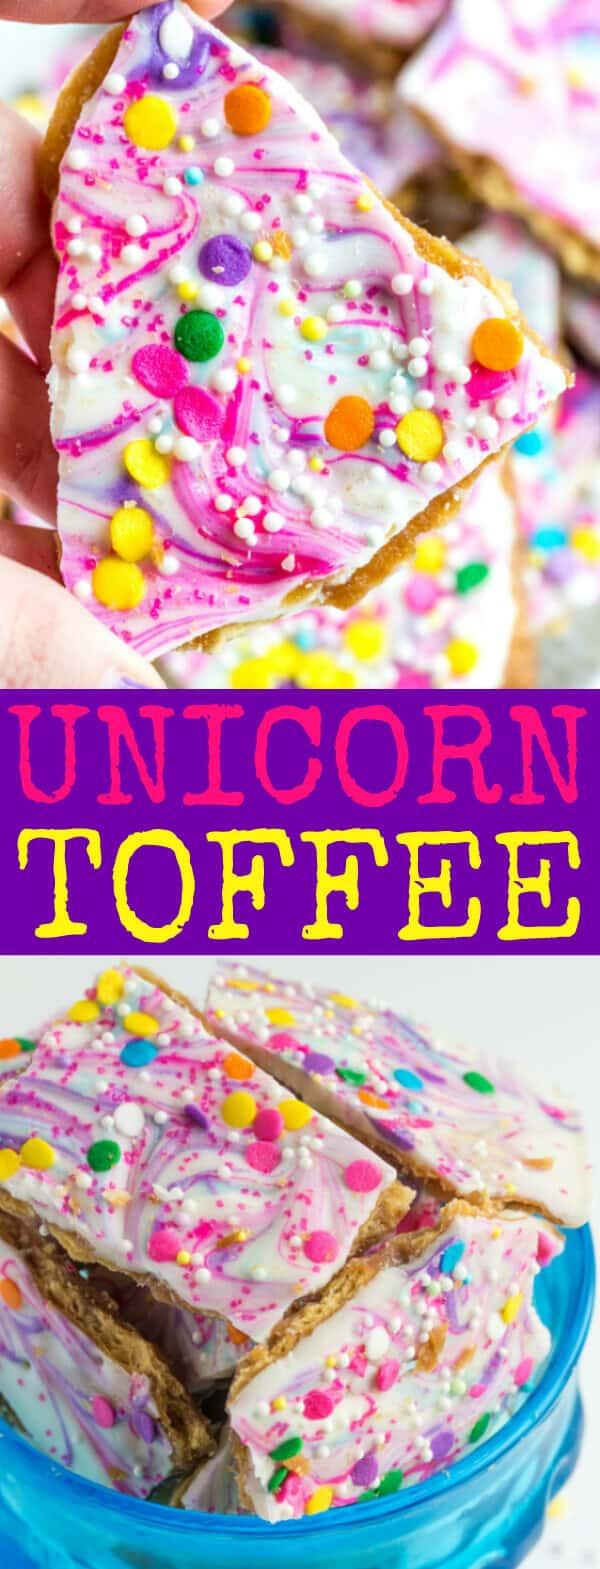 Unicorn Toffee